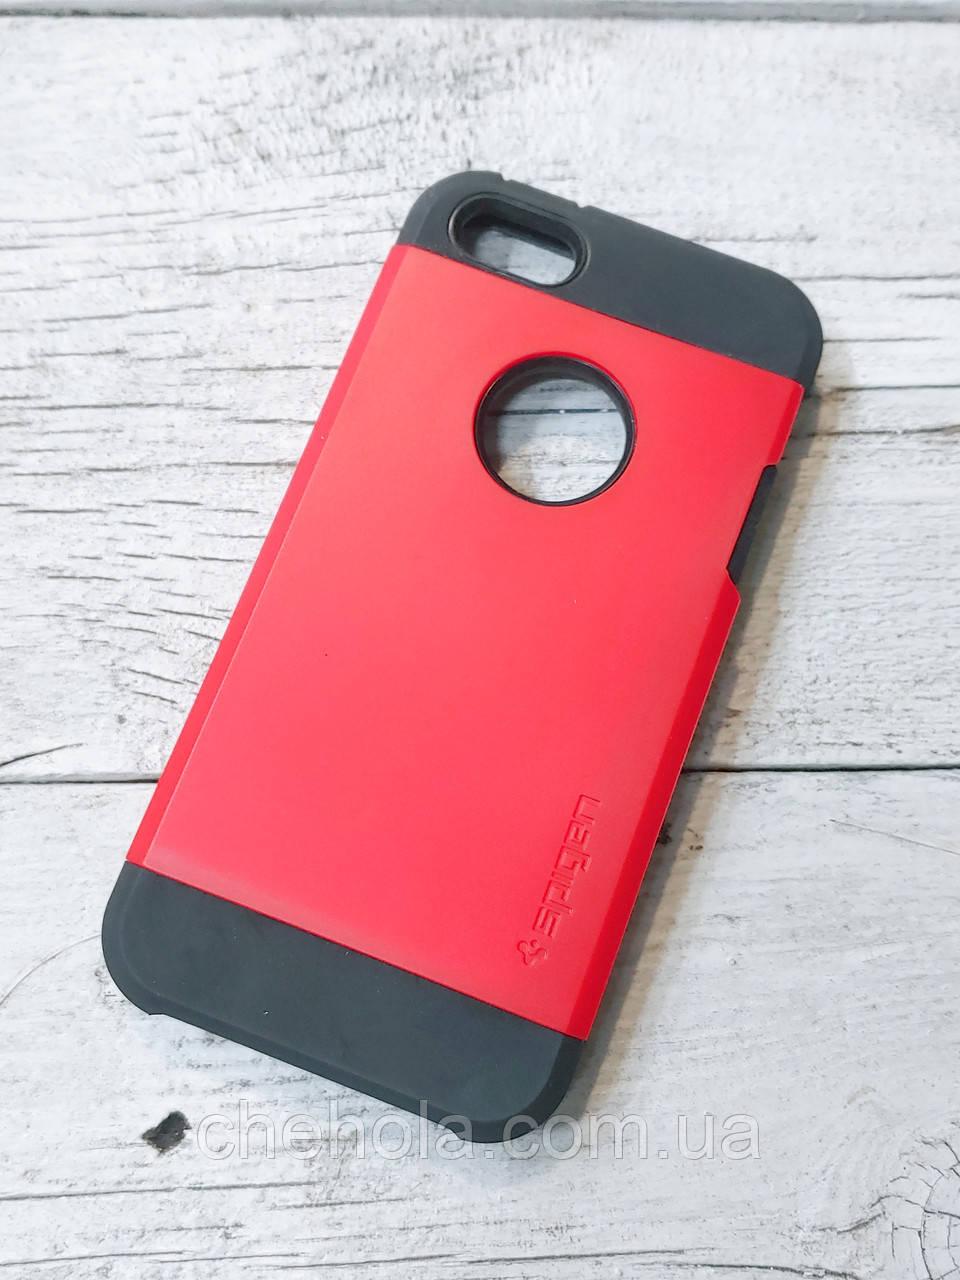 Протиударний чохол для iPhone 5 5S SE SGP Tough Armor Червоний